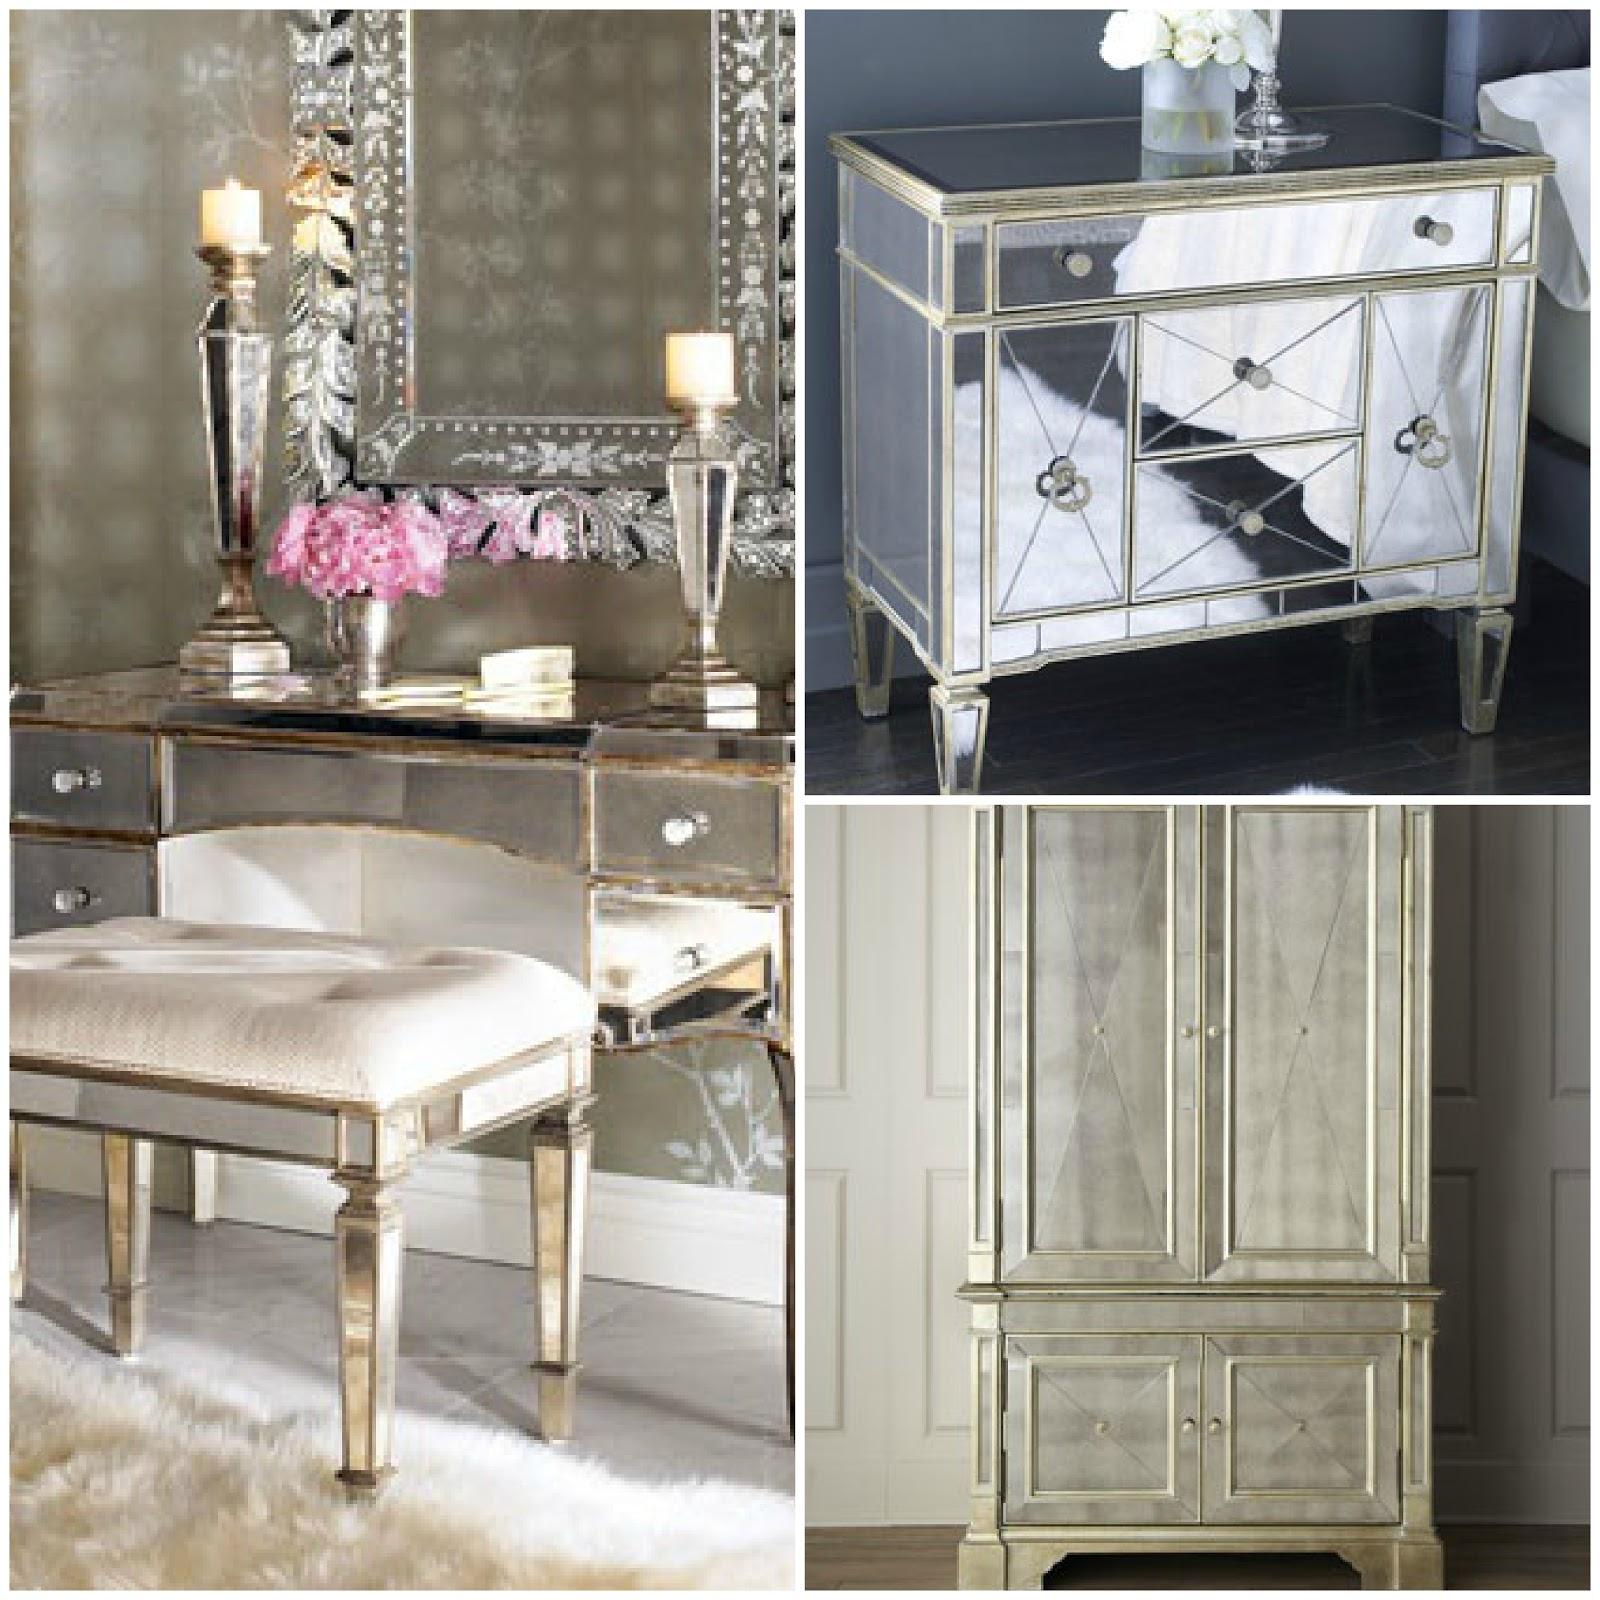 mirrored furniture bedroom designs photo - 9